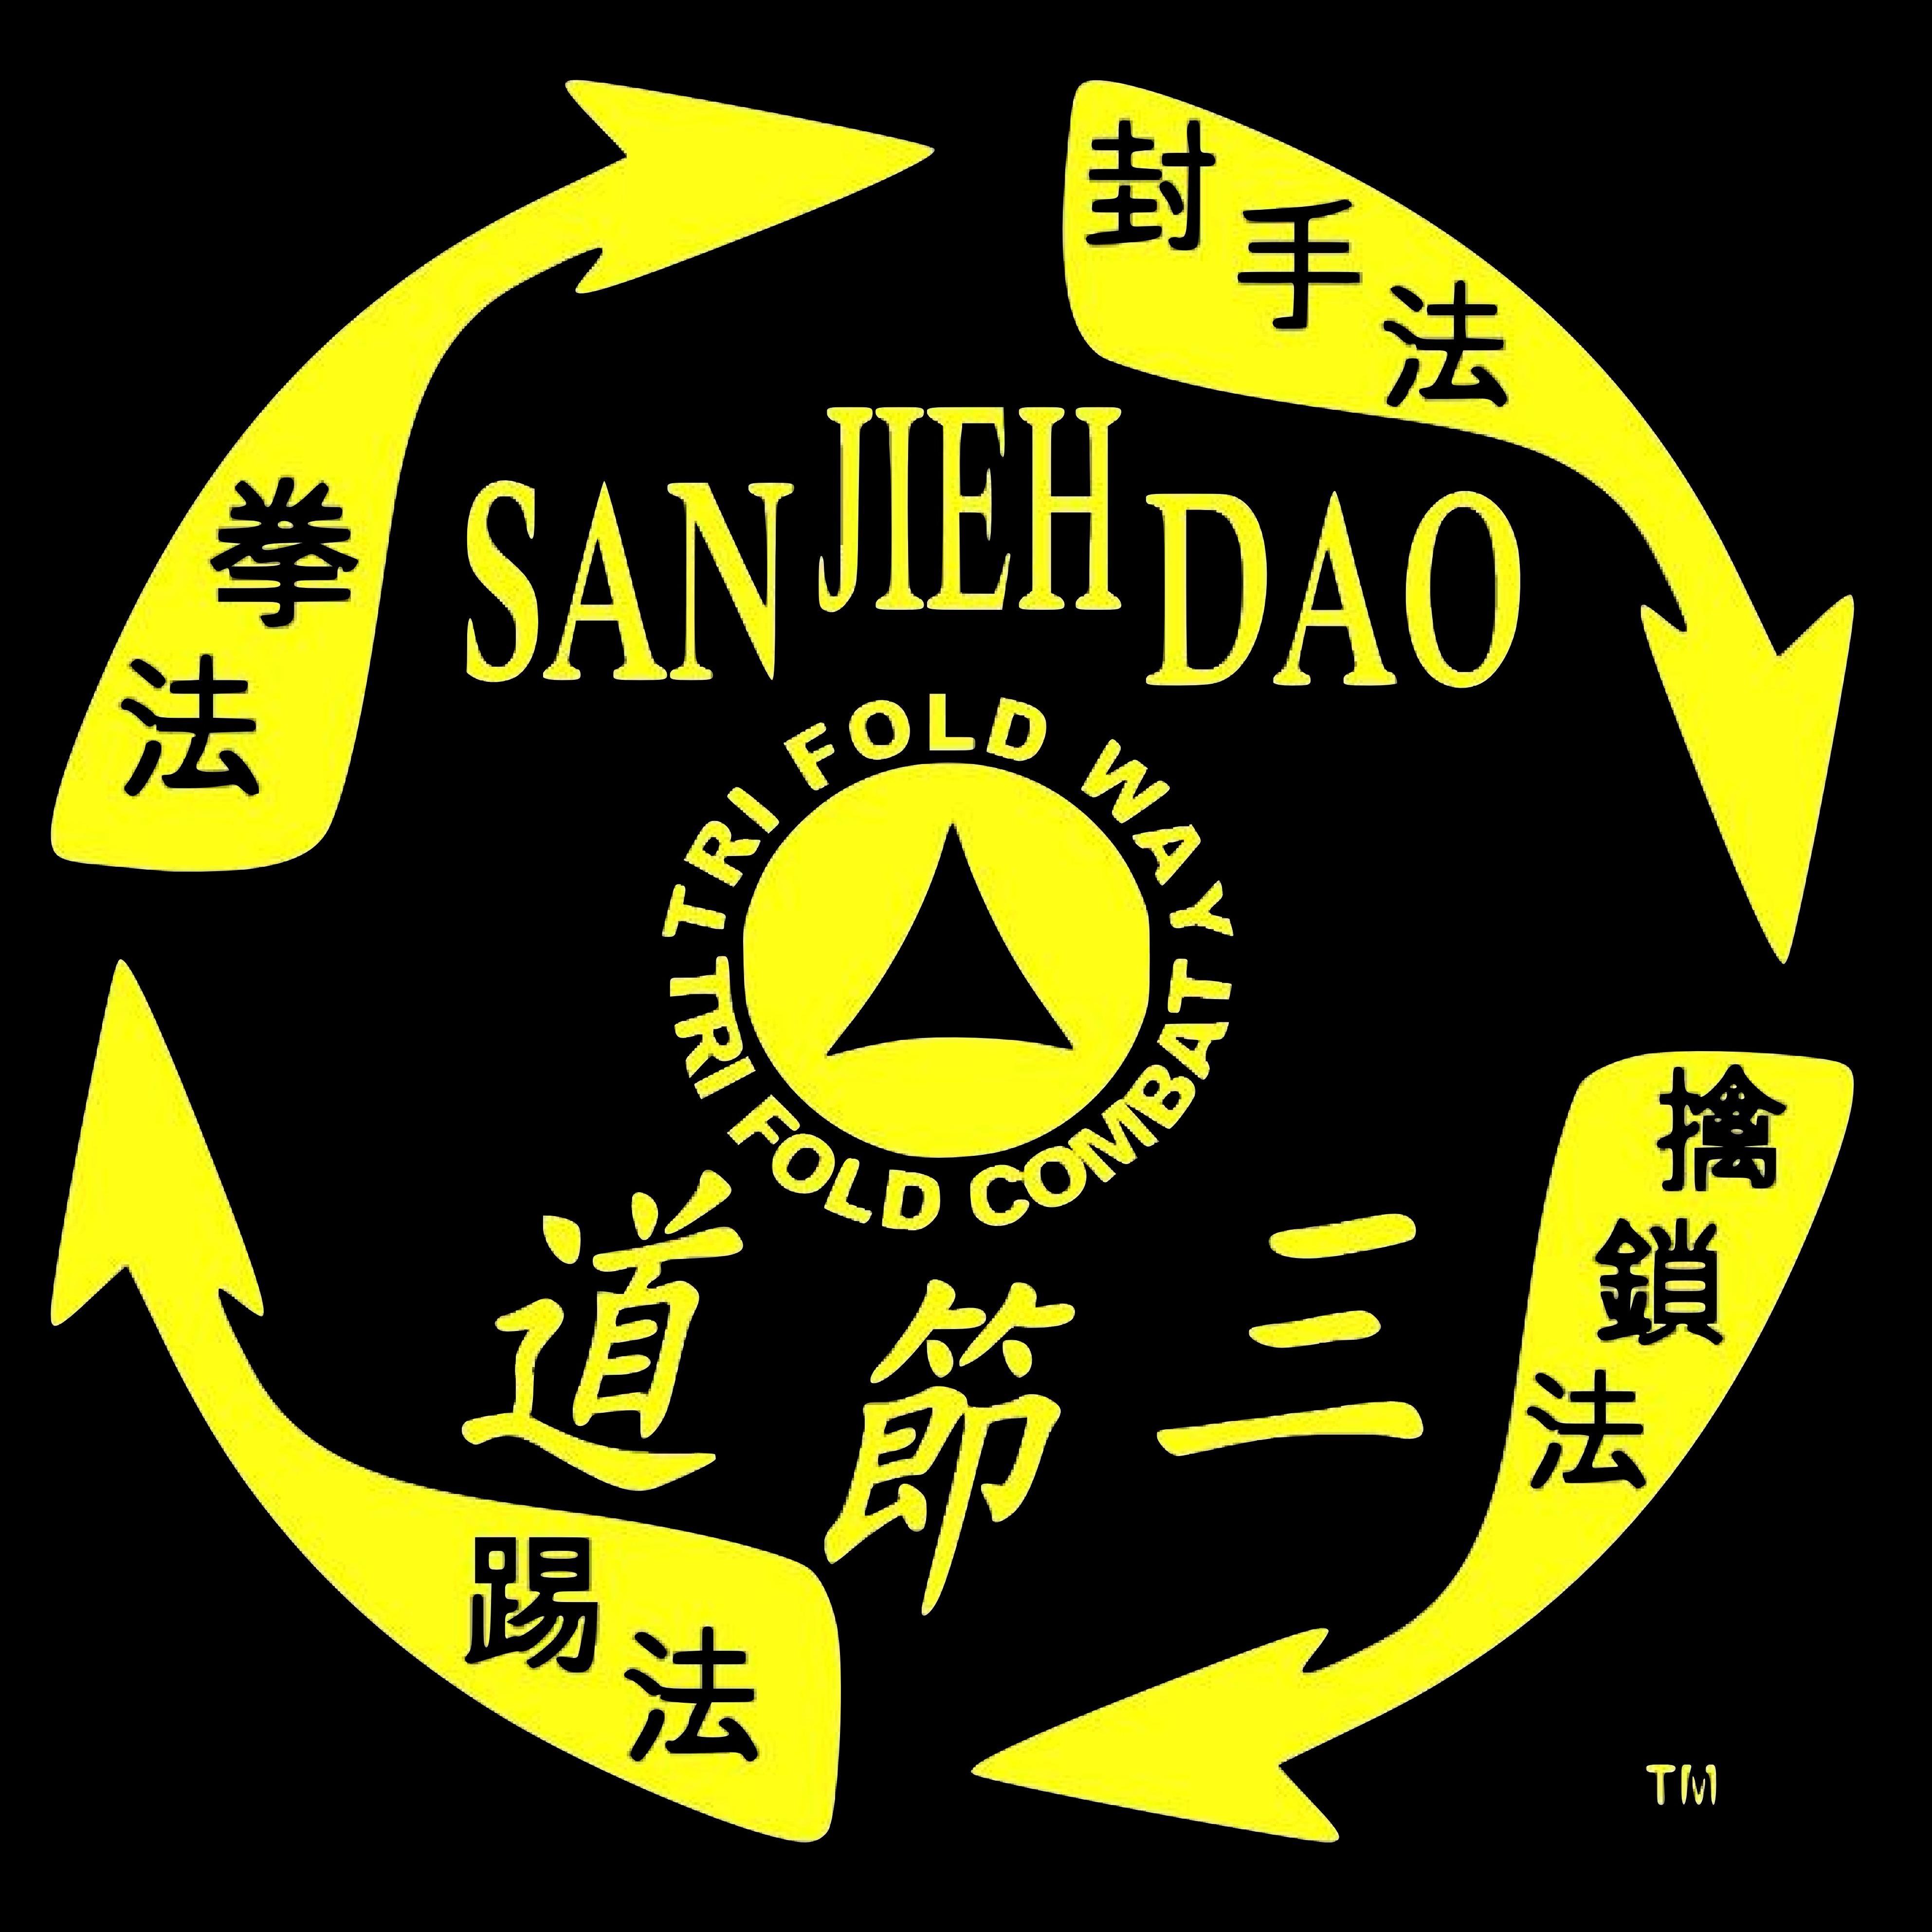 San Jieh Dao image 5